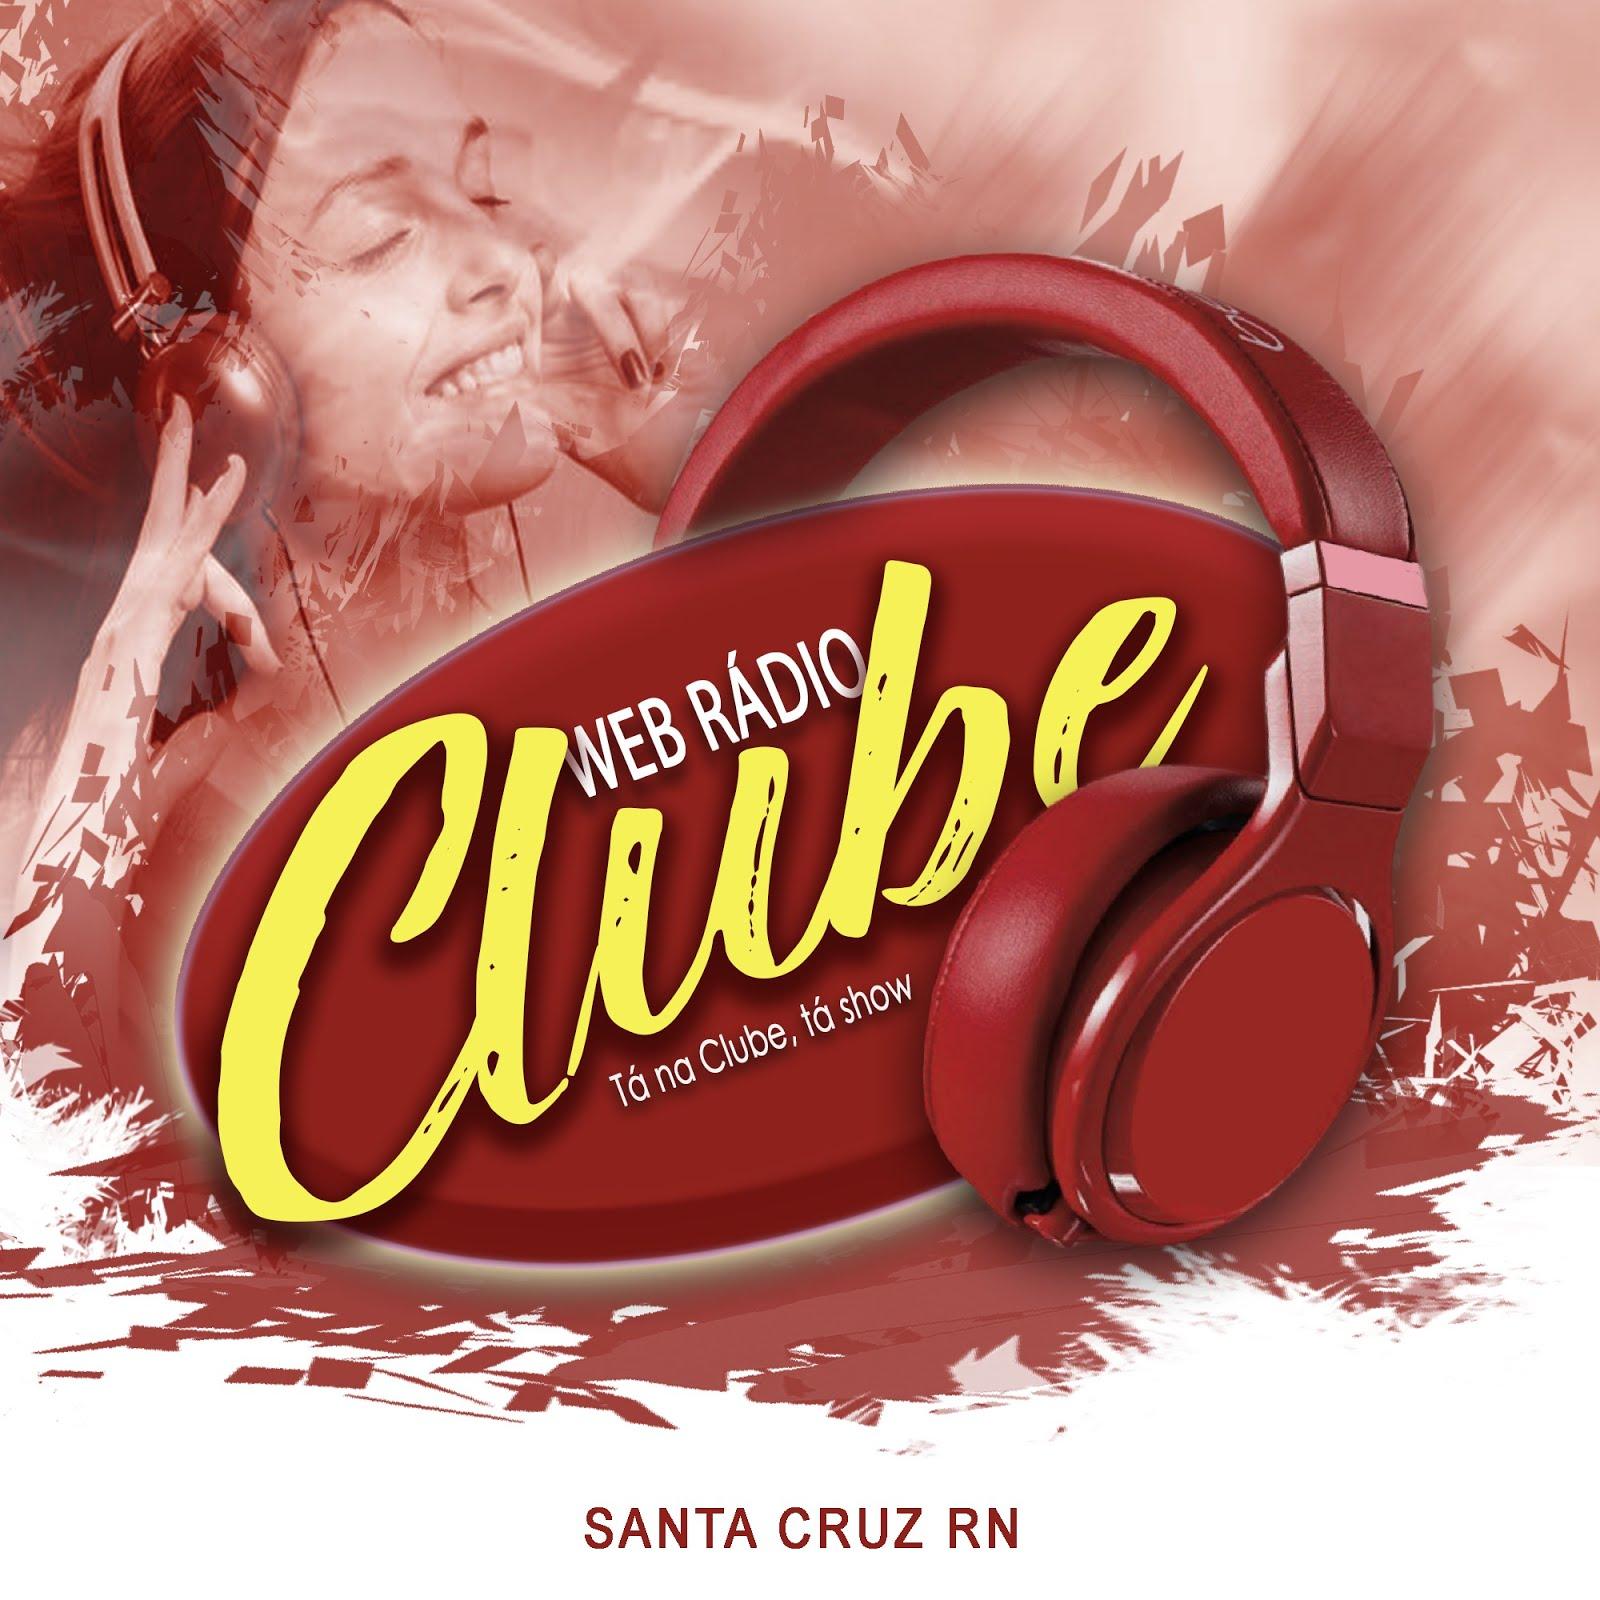 Web rádio clube